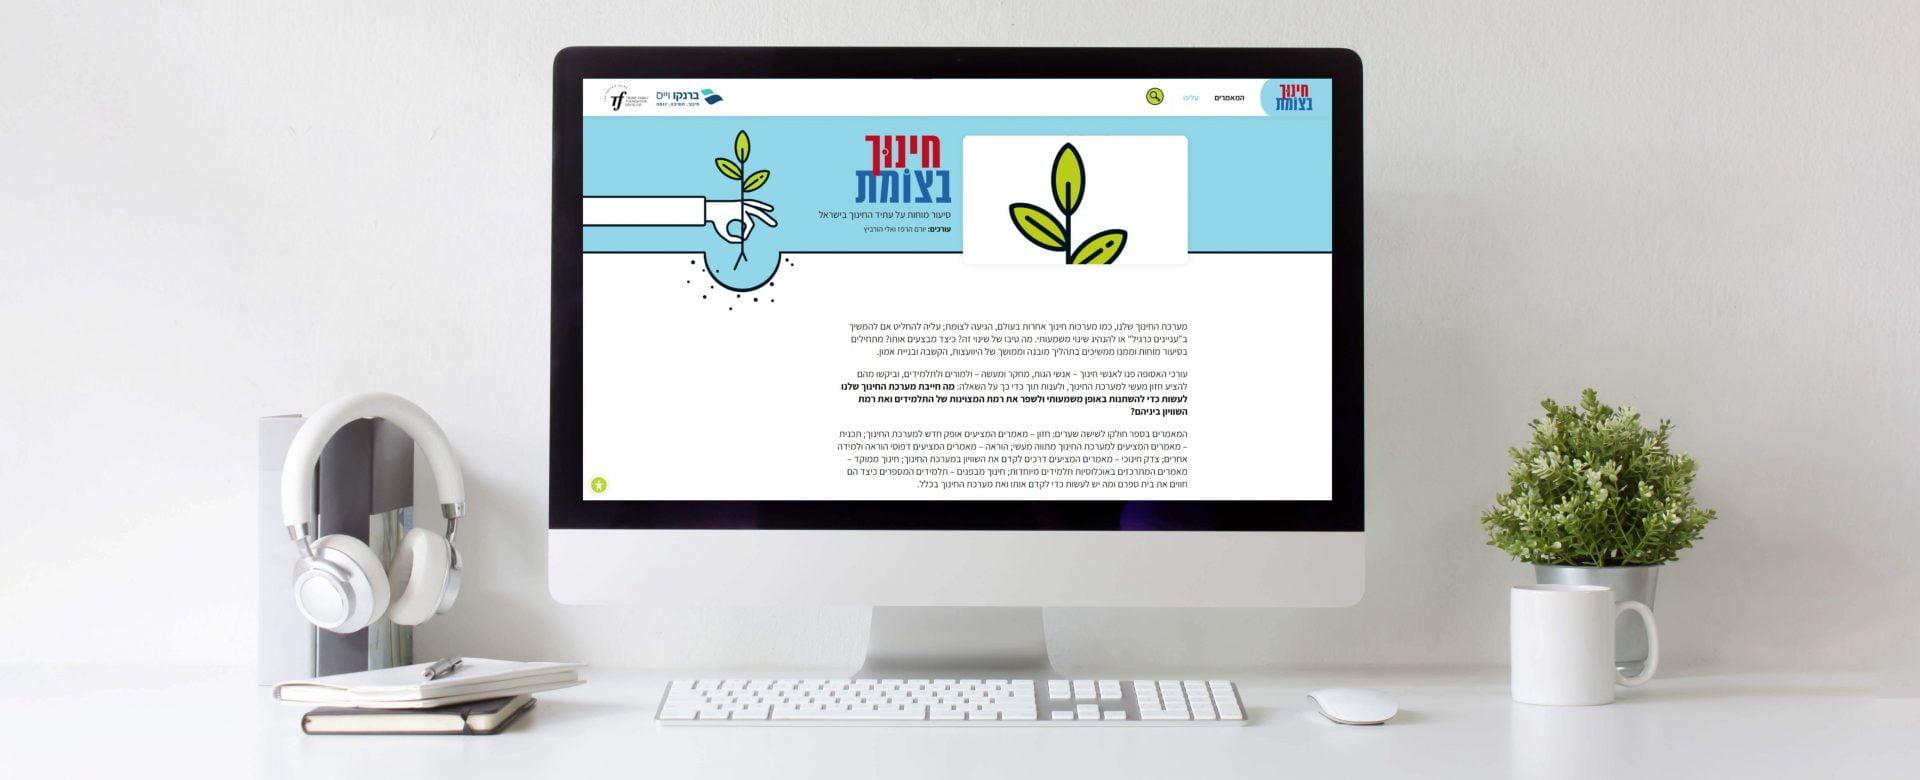 EducationBook site 1